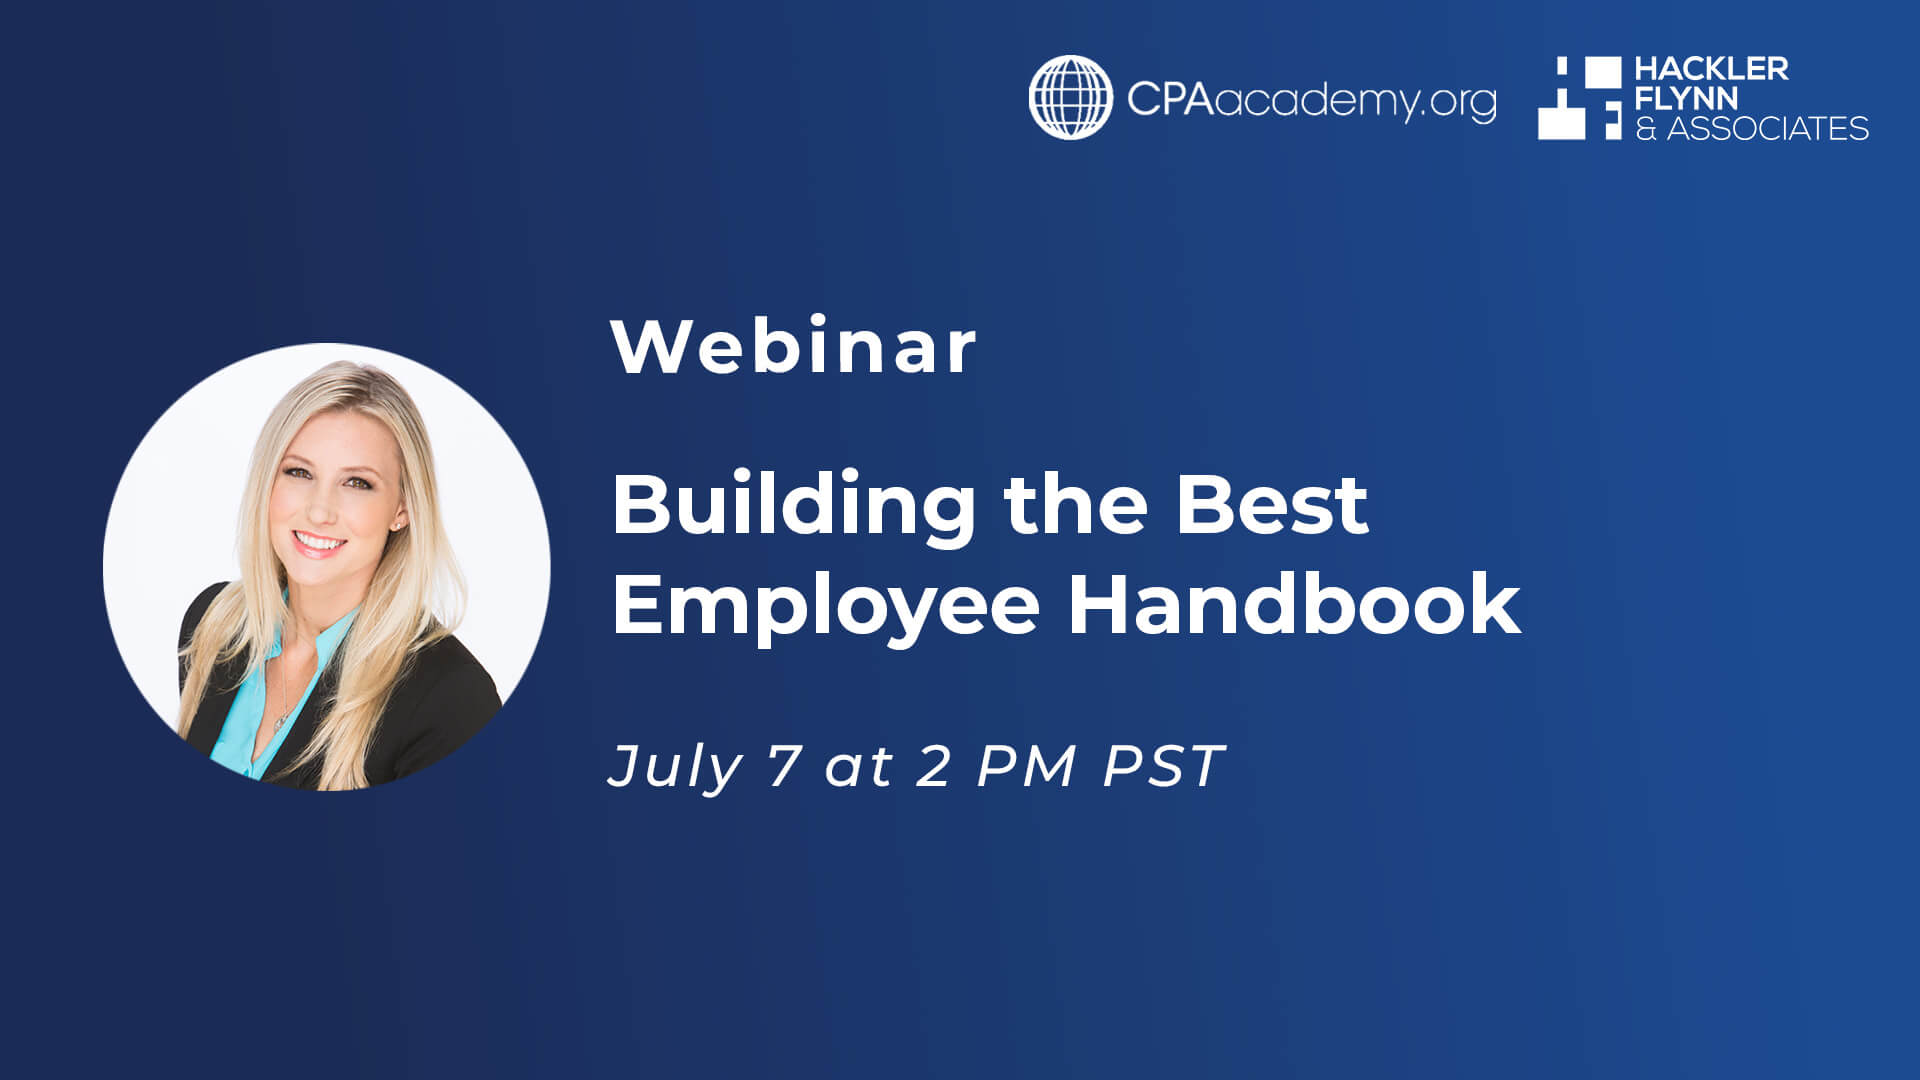 Webinar Graphic for Building the Best Employee Handbook